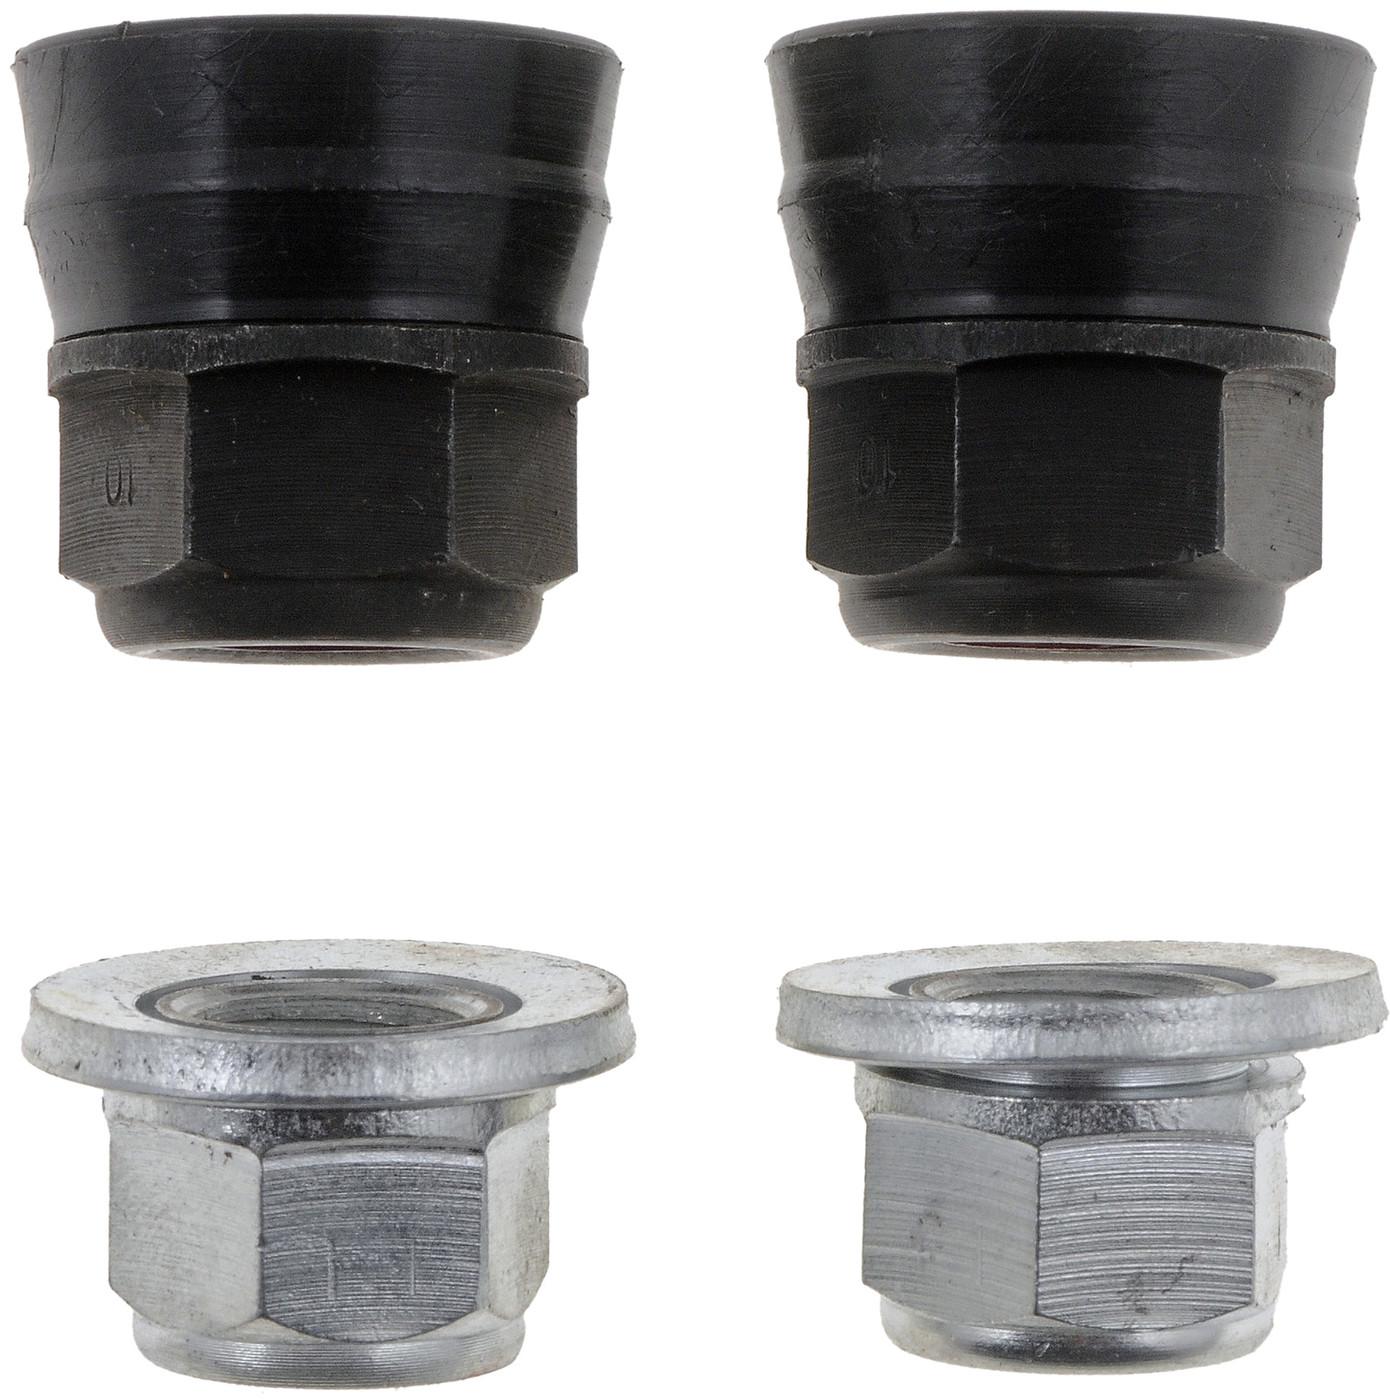 DORMAN - HELP - Suspension Ball Joint Nut / Washer - RNB 13586